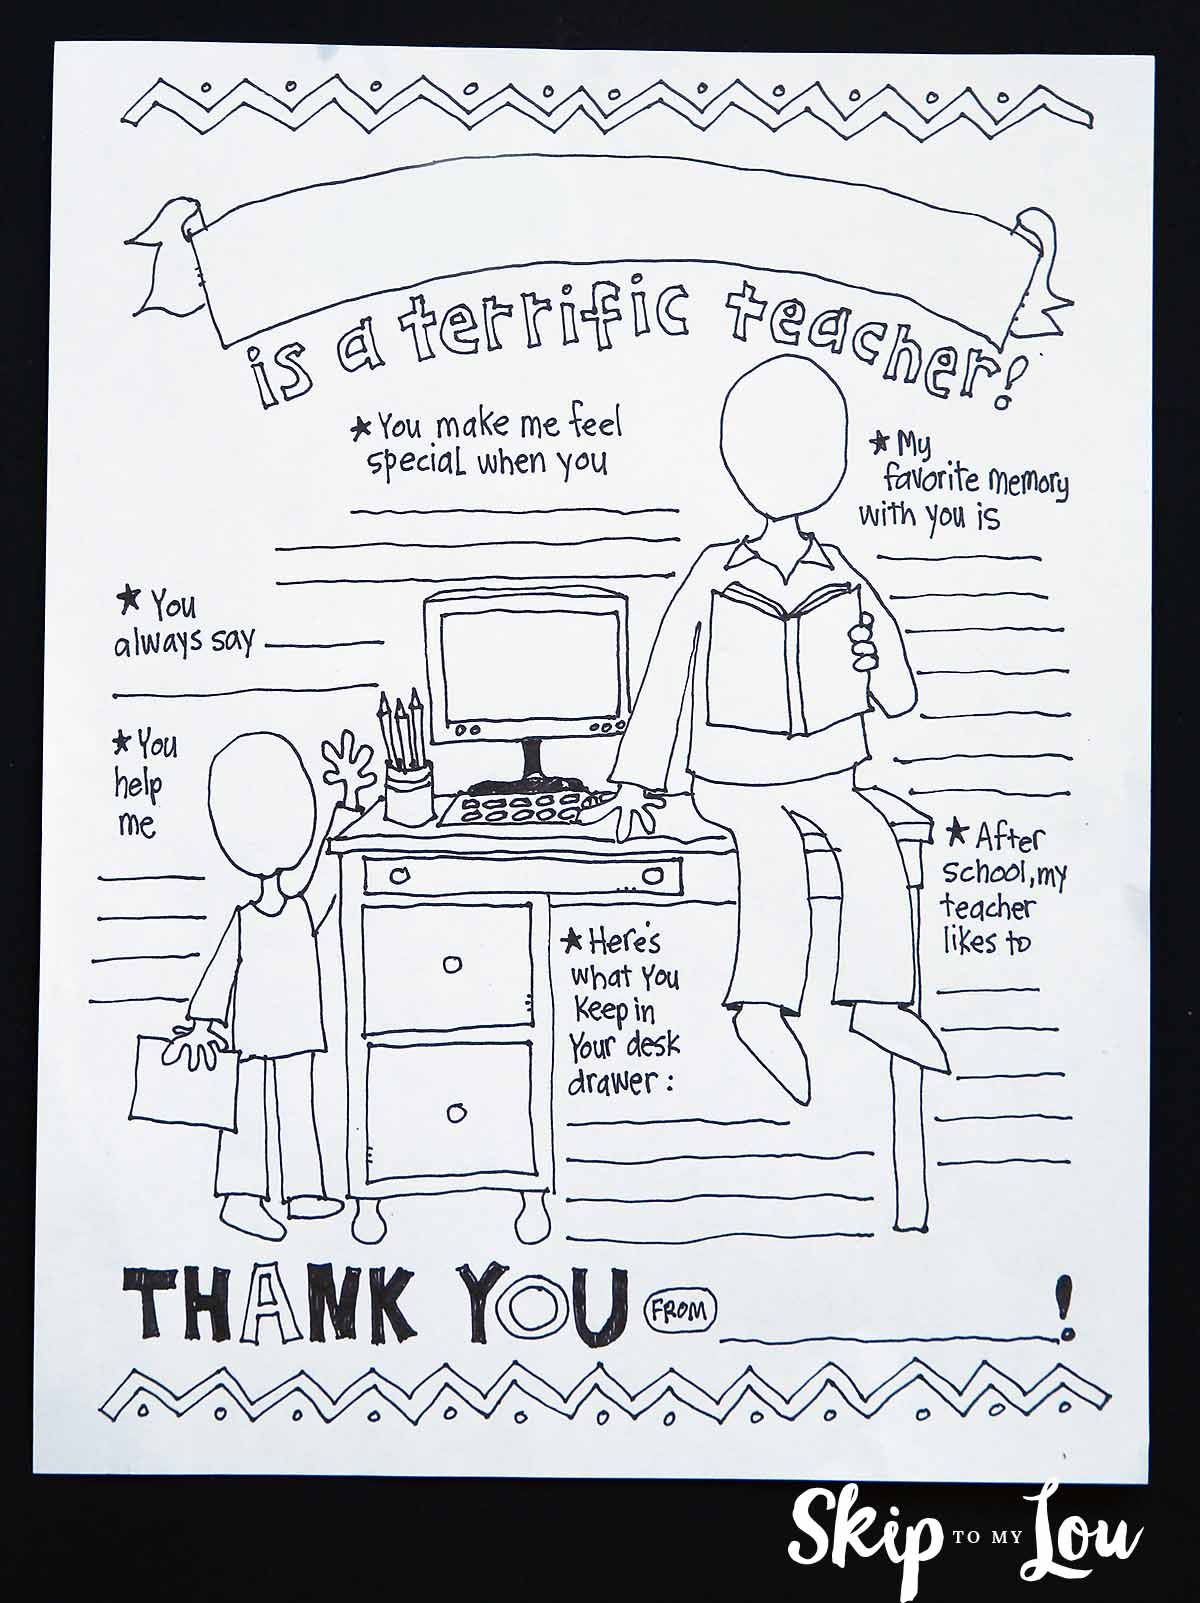 Hundreds Of Teacher Appreciation Ideas To Make The Best